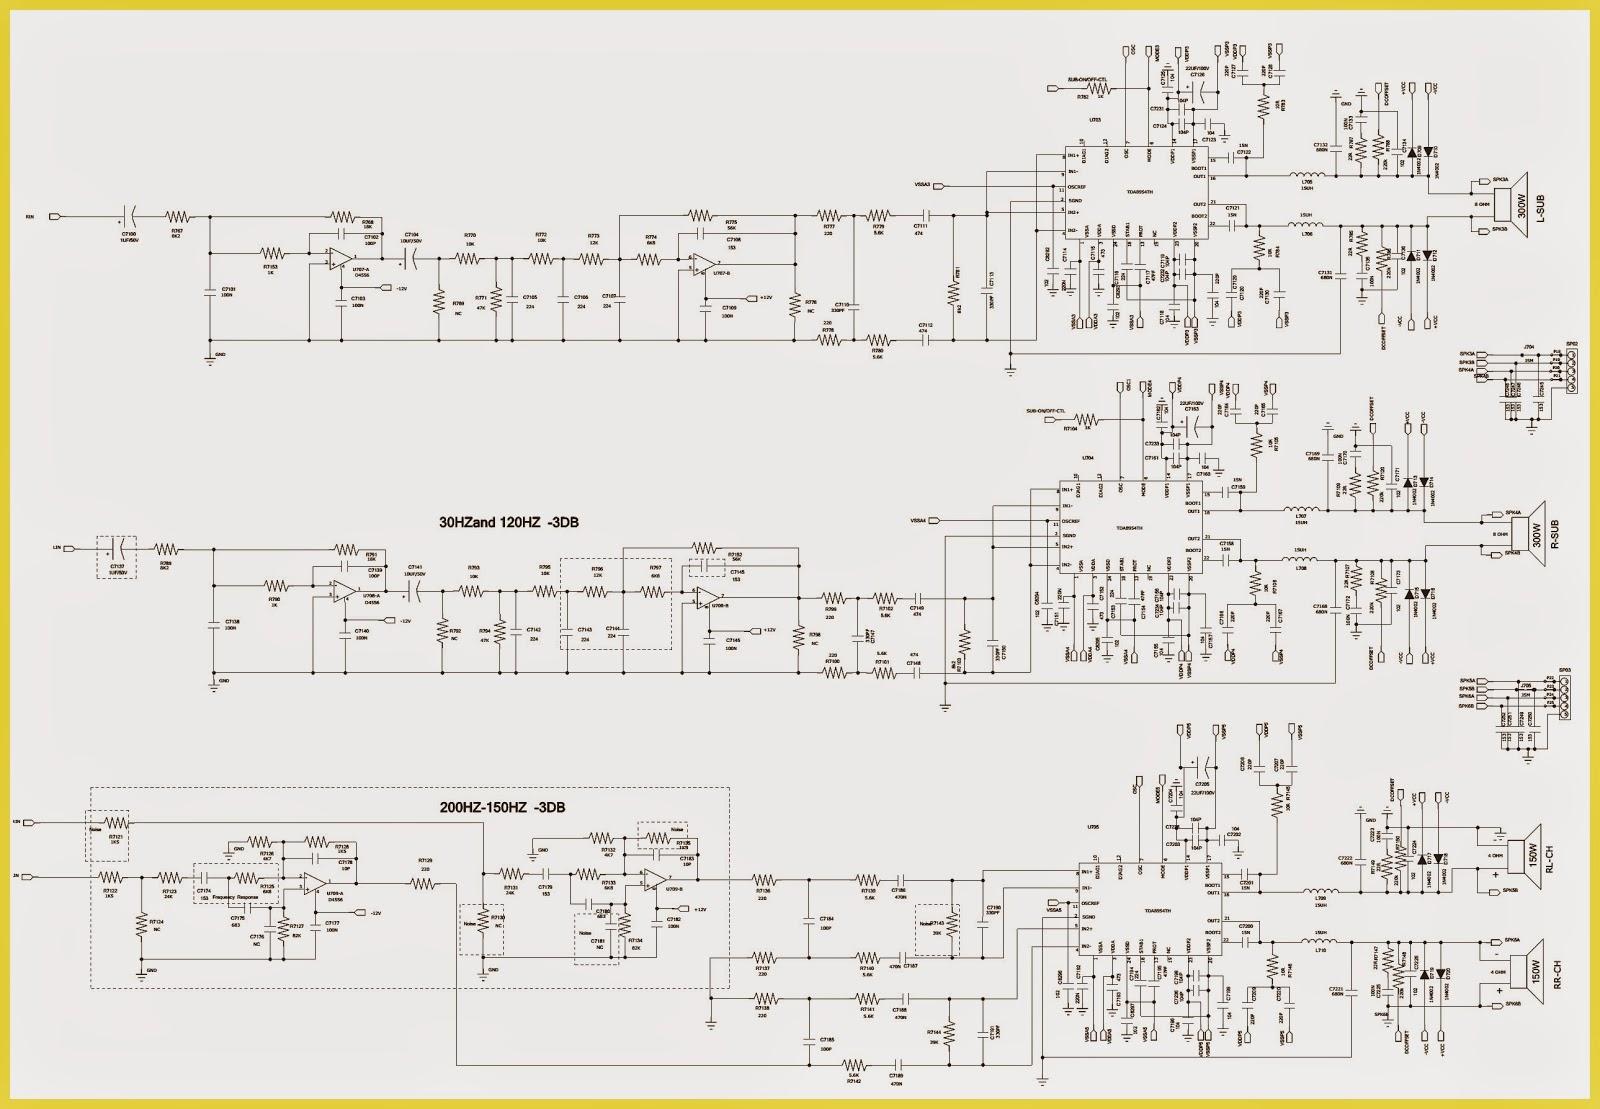 PHILIPS FWT9200 – MINI Hi-Fi SYSTEM - SCHEMATIC DIAGRAM | Electro help